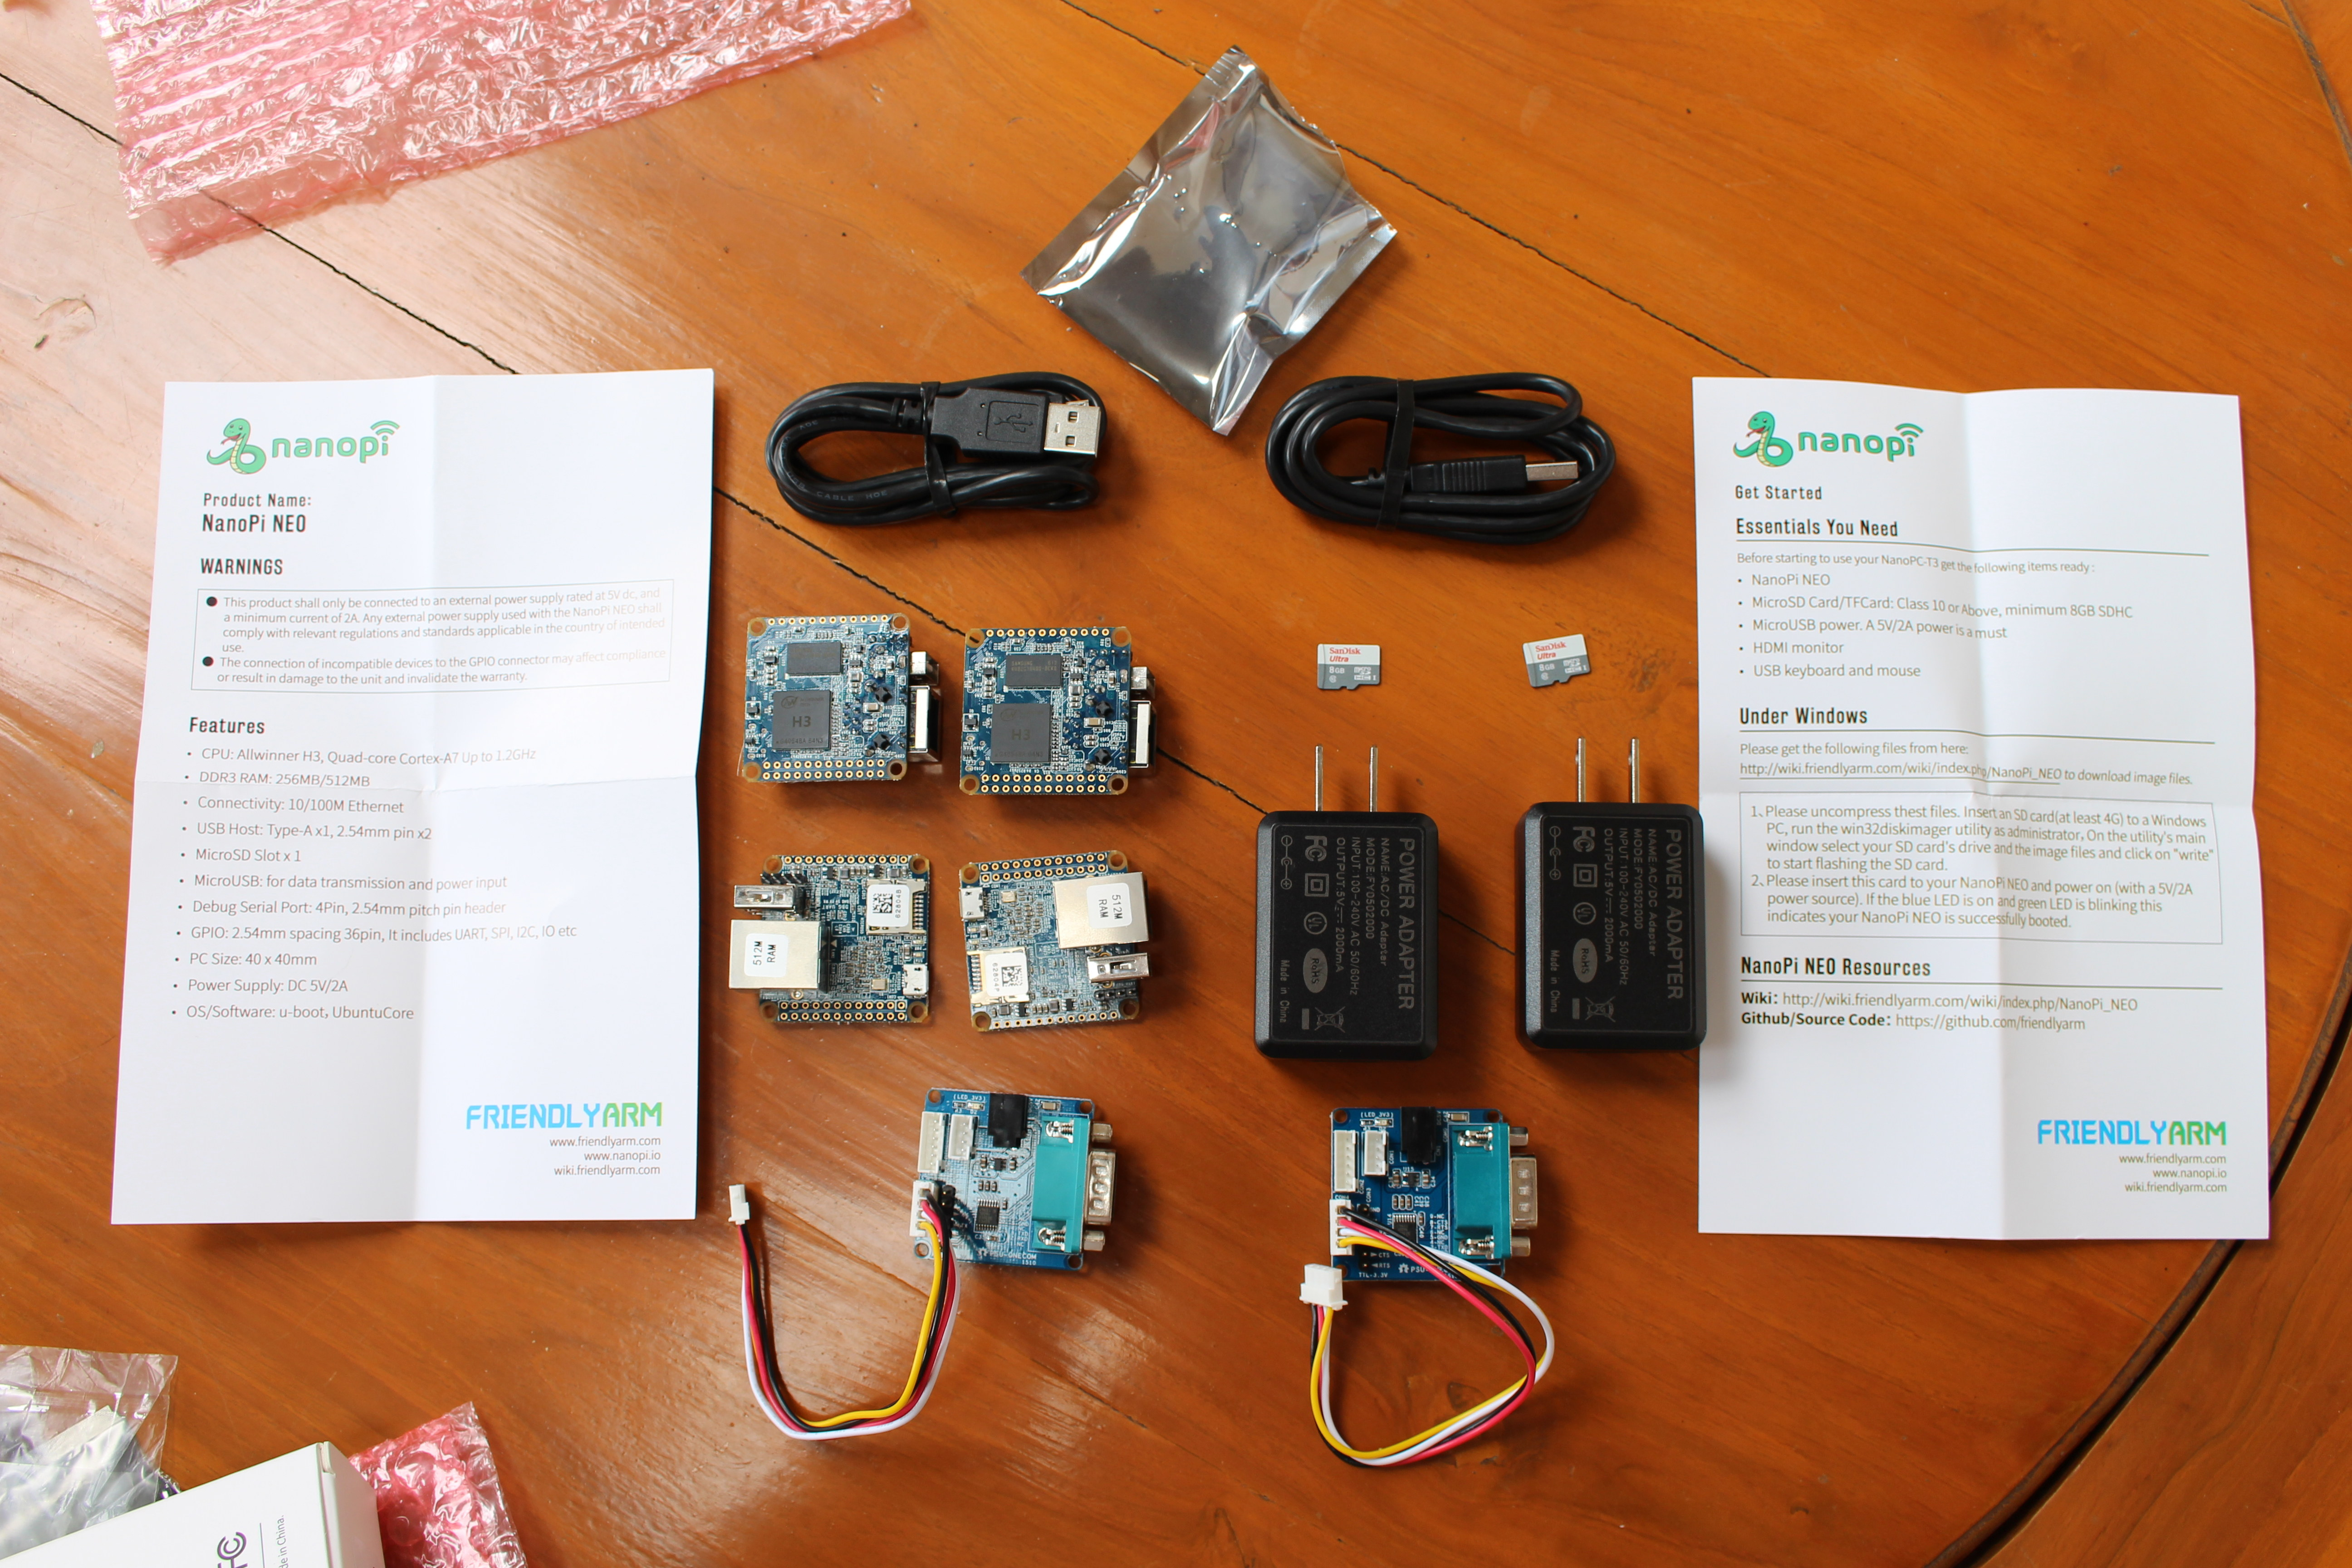 Getting Started with NanoPi NEO Development Board - Ubuntu Core Firmware